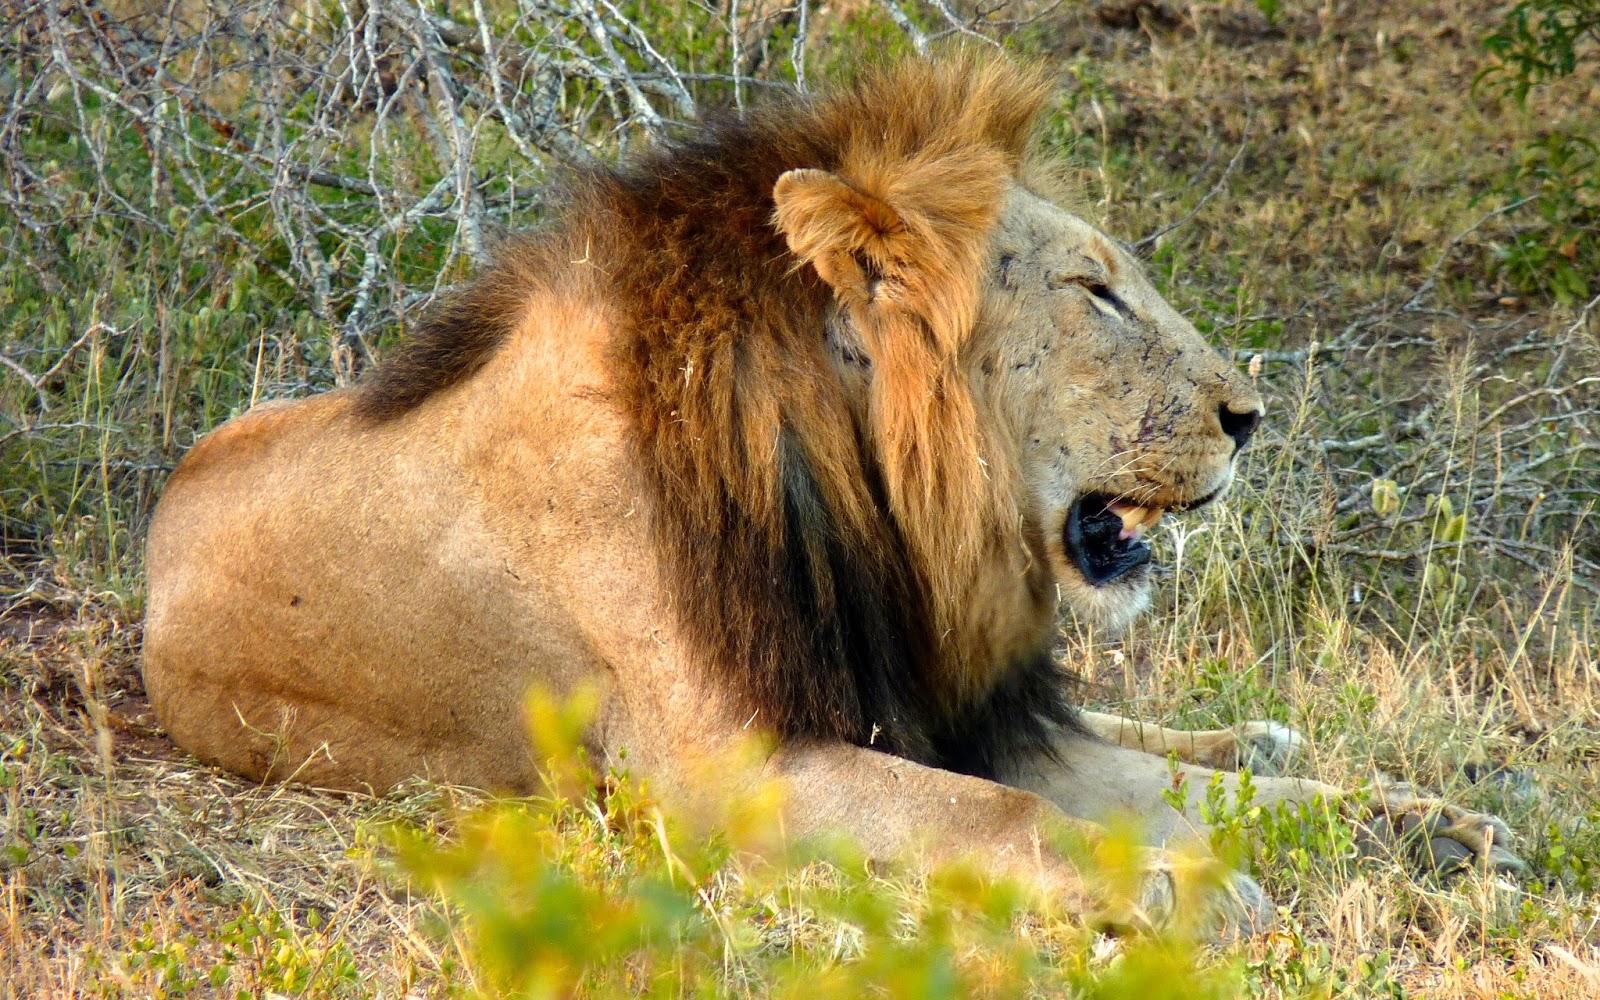 Lion sitting - photo#17